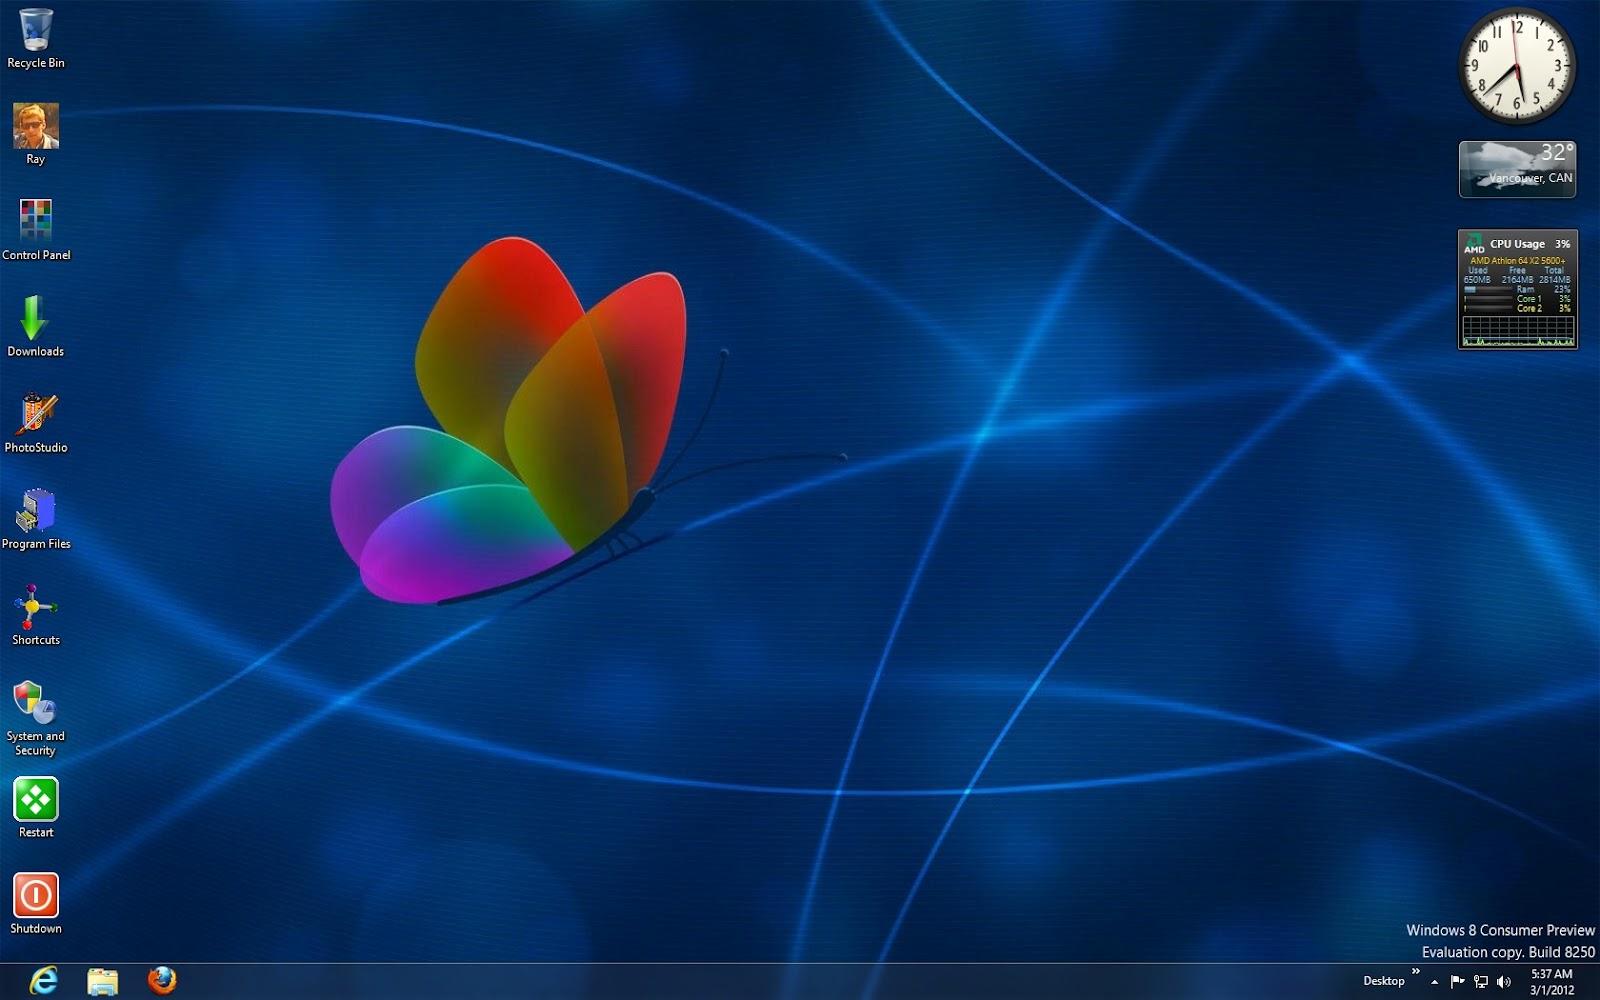 Free download Desktop Icons Windows 7 Desktop Is Blank